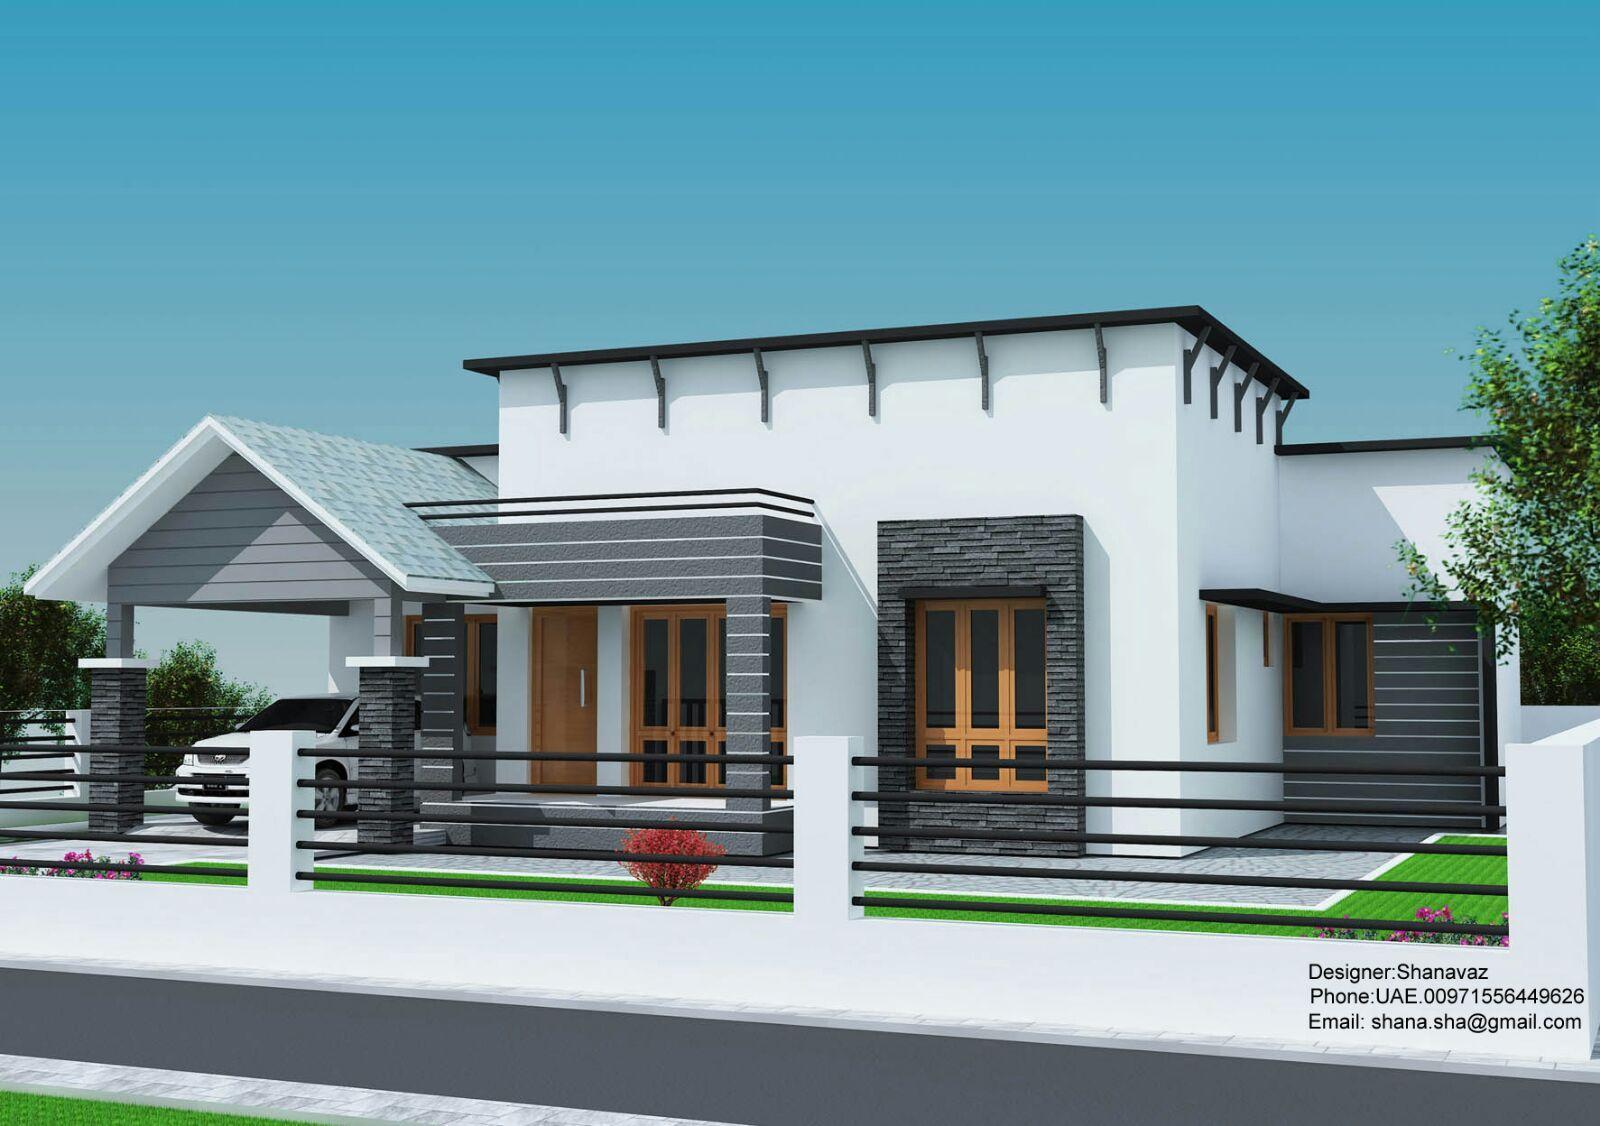 3 Bedroom Cute Kerala Home Plan, Budget 3 Bedroom Kerala Home Plan ...